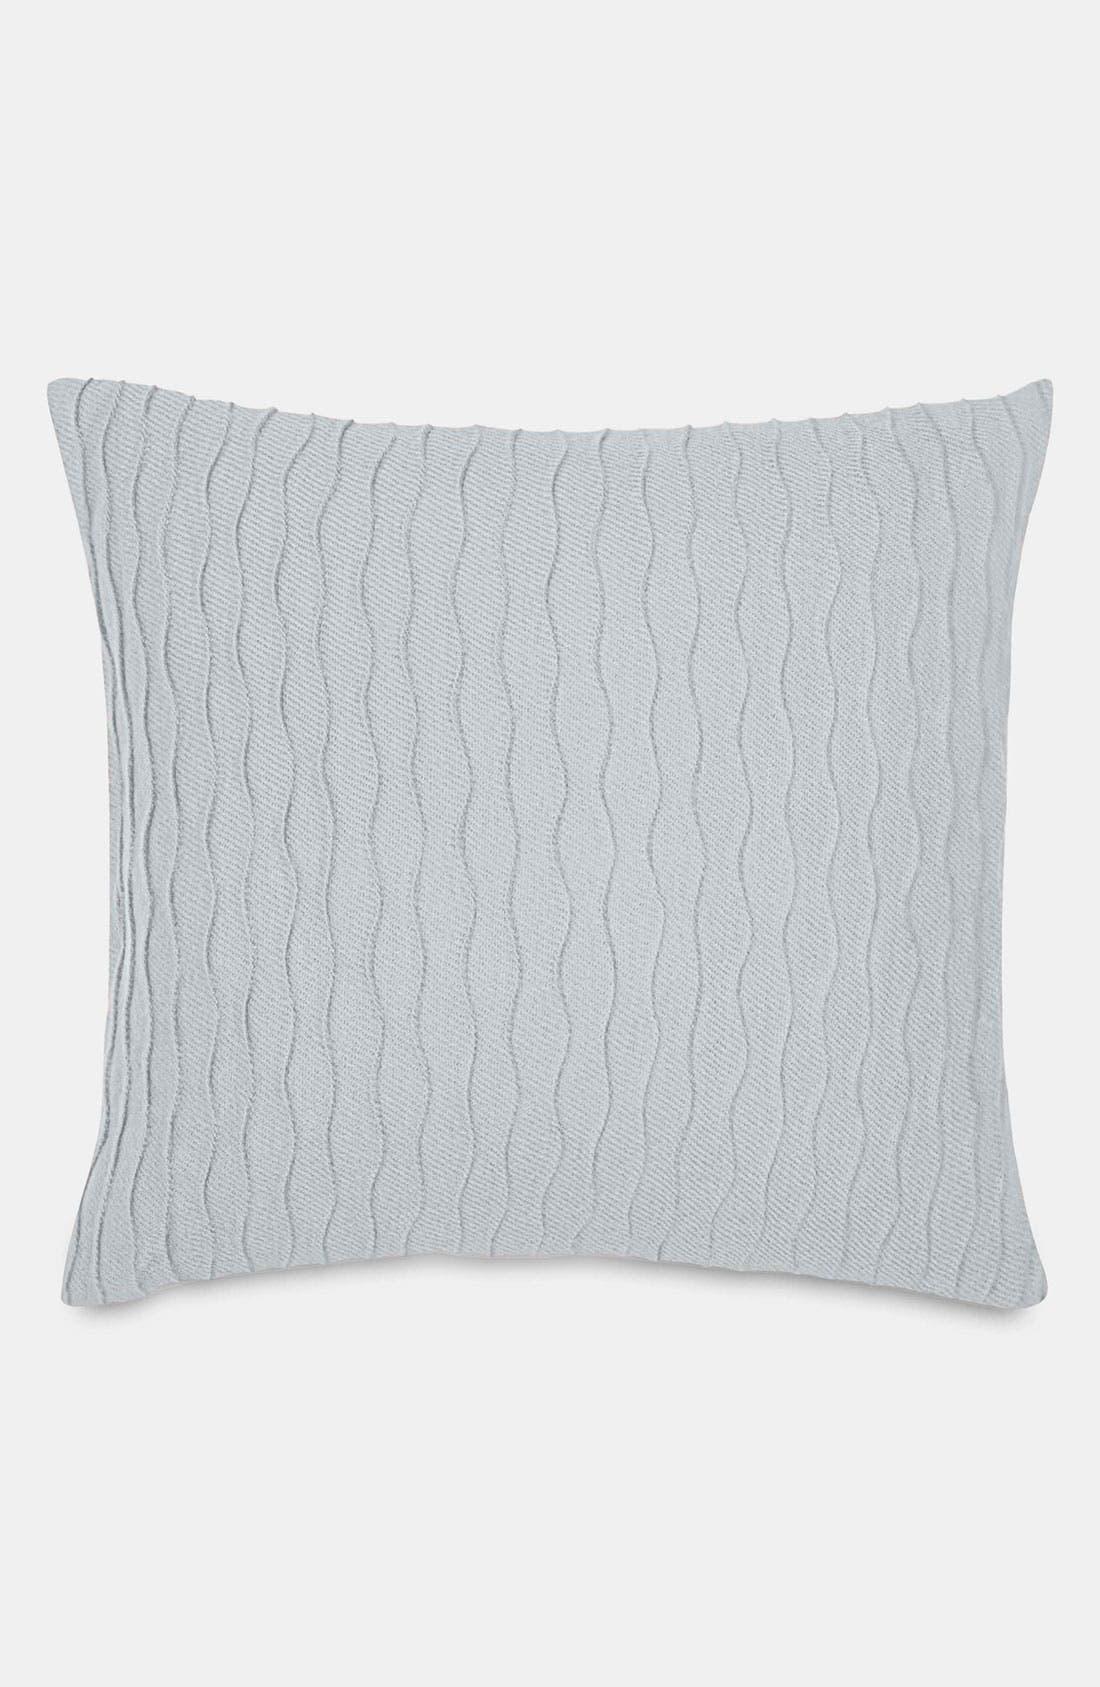 Alternate Image 1 Selected - DKNY 'Urban Tide' Euro Pillow Sham